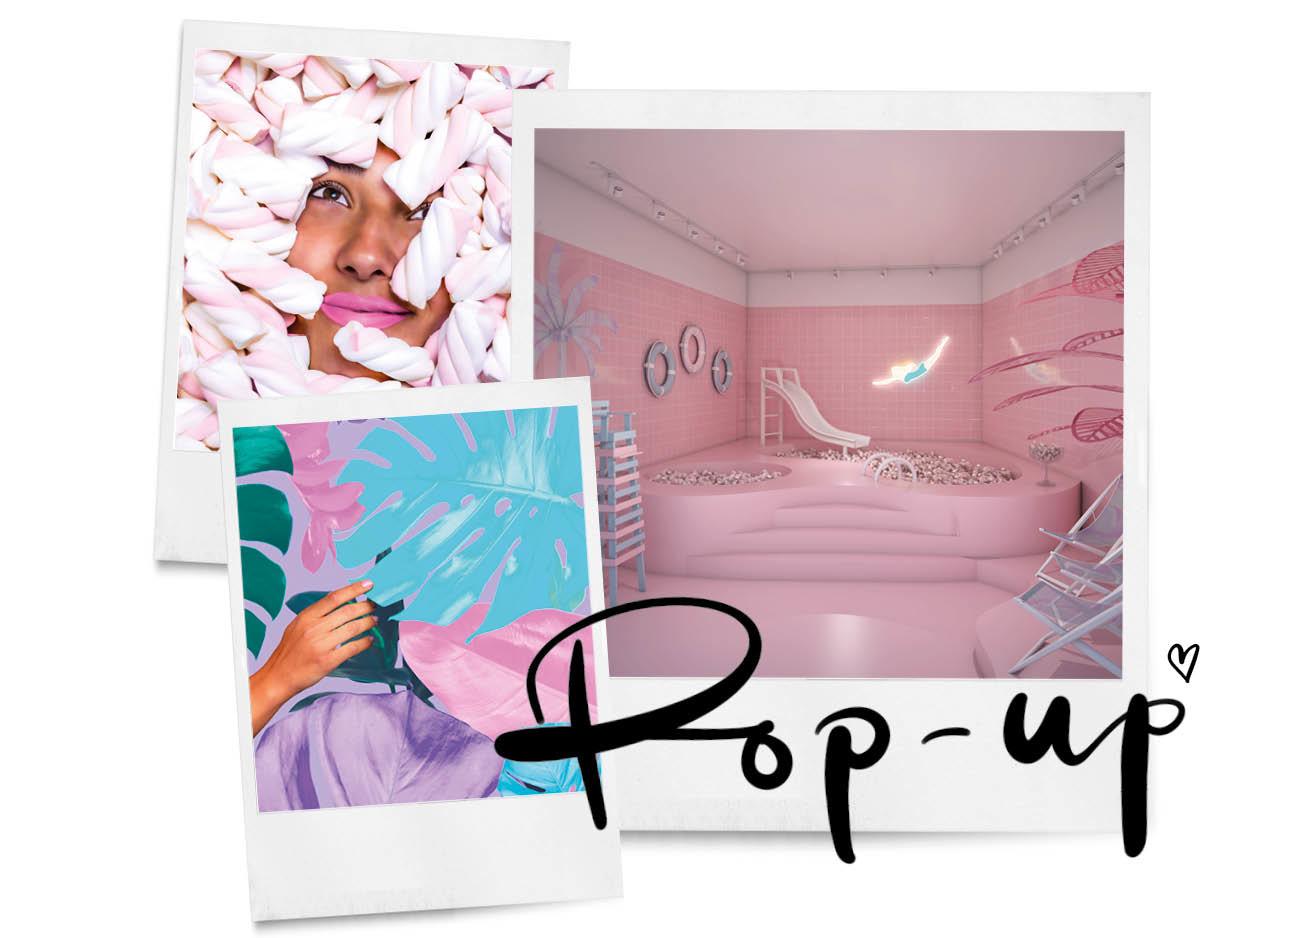 pop up restaurant Wondr amsterdan noord roze gekleurde ruimtes met snoep en spekjes